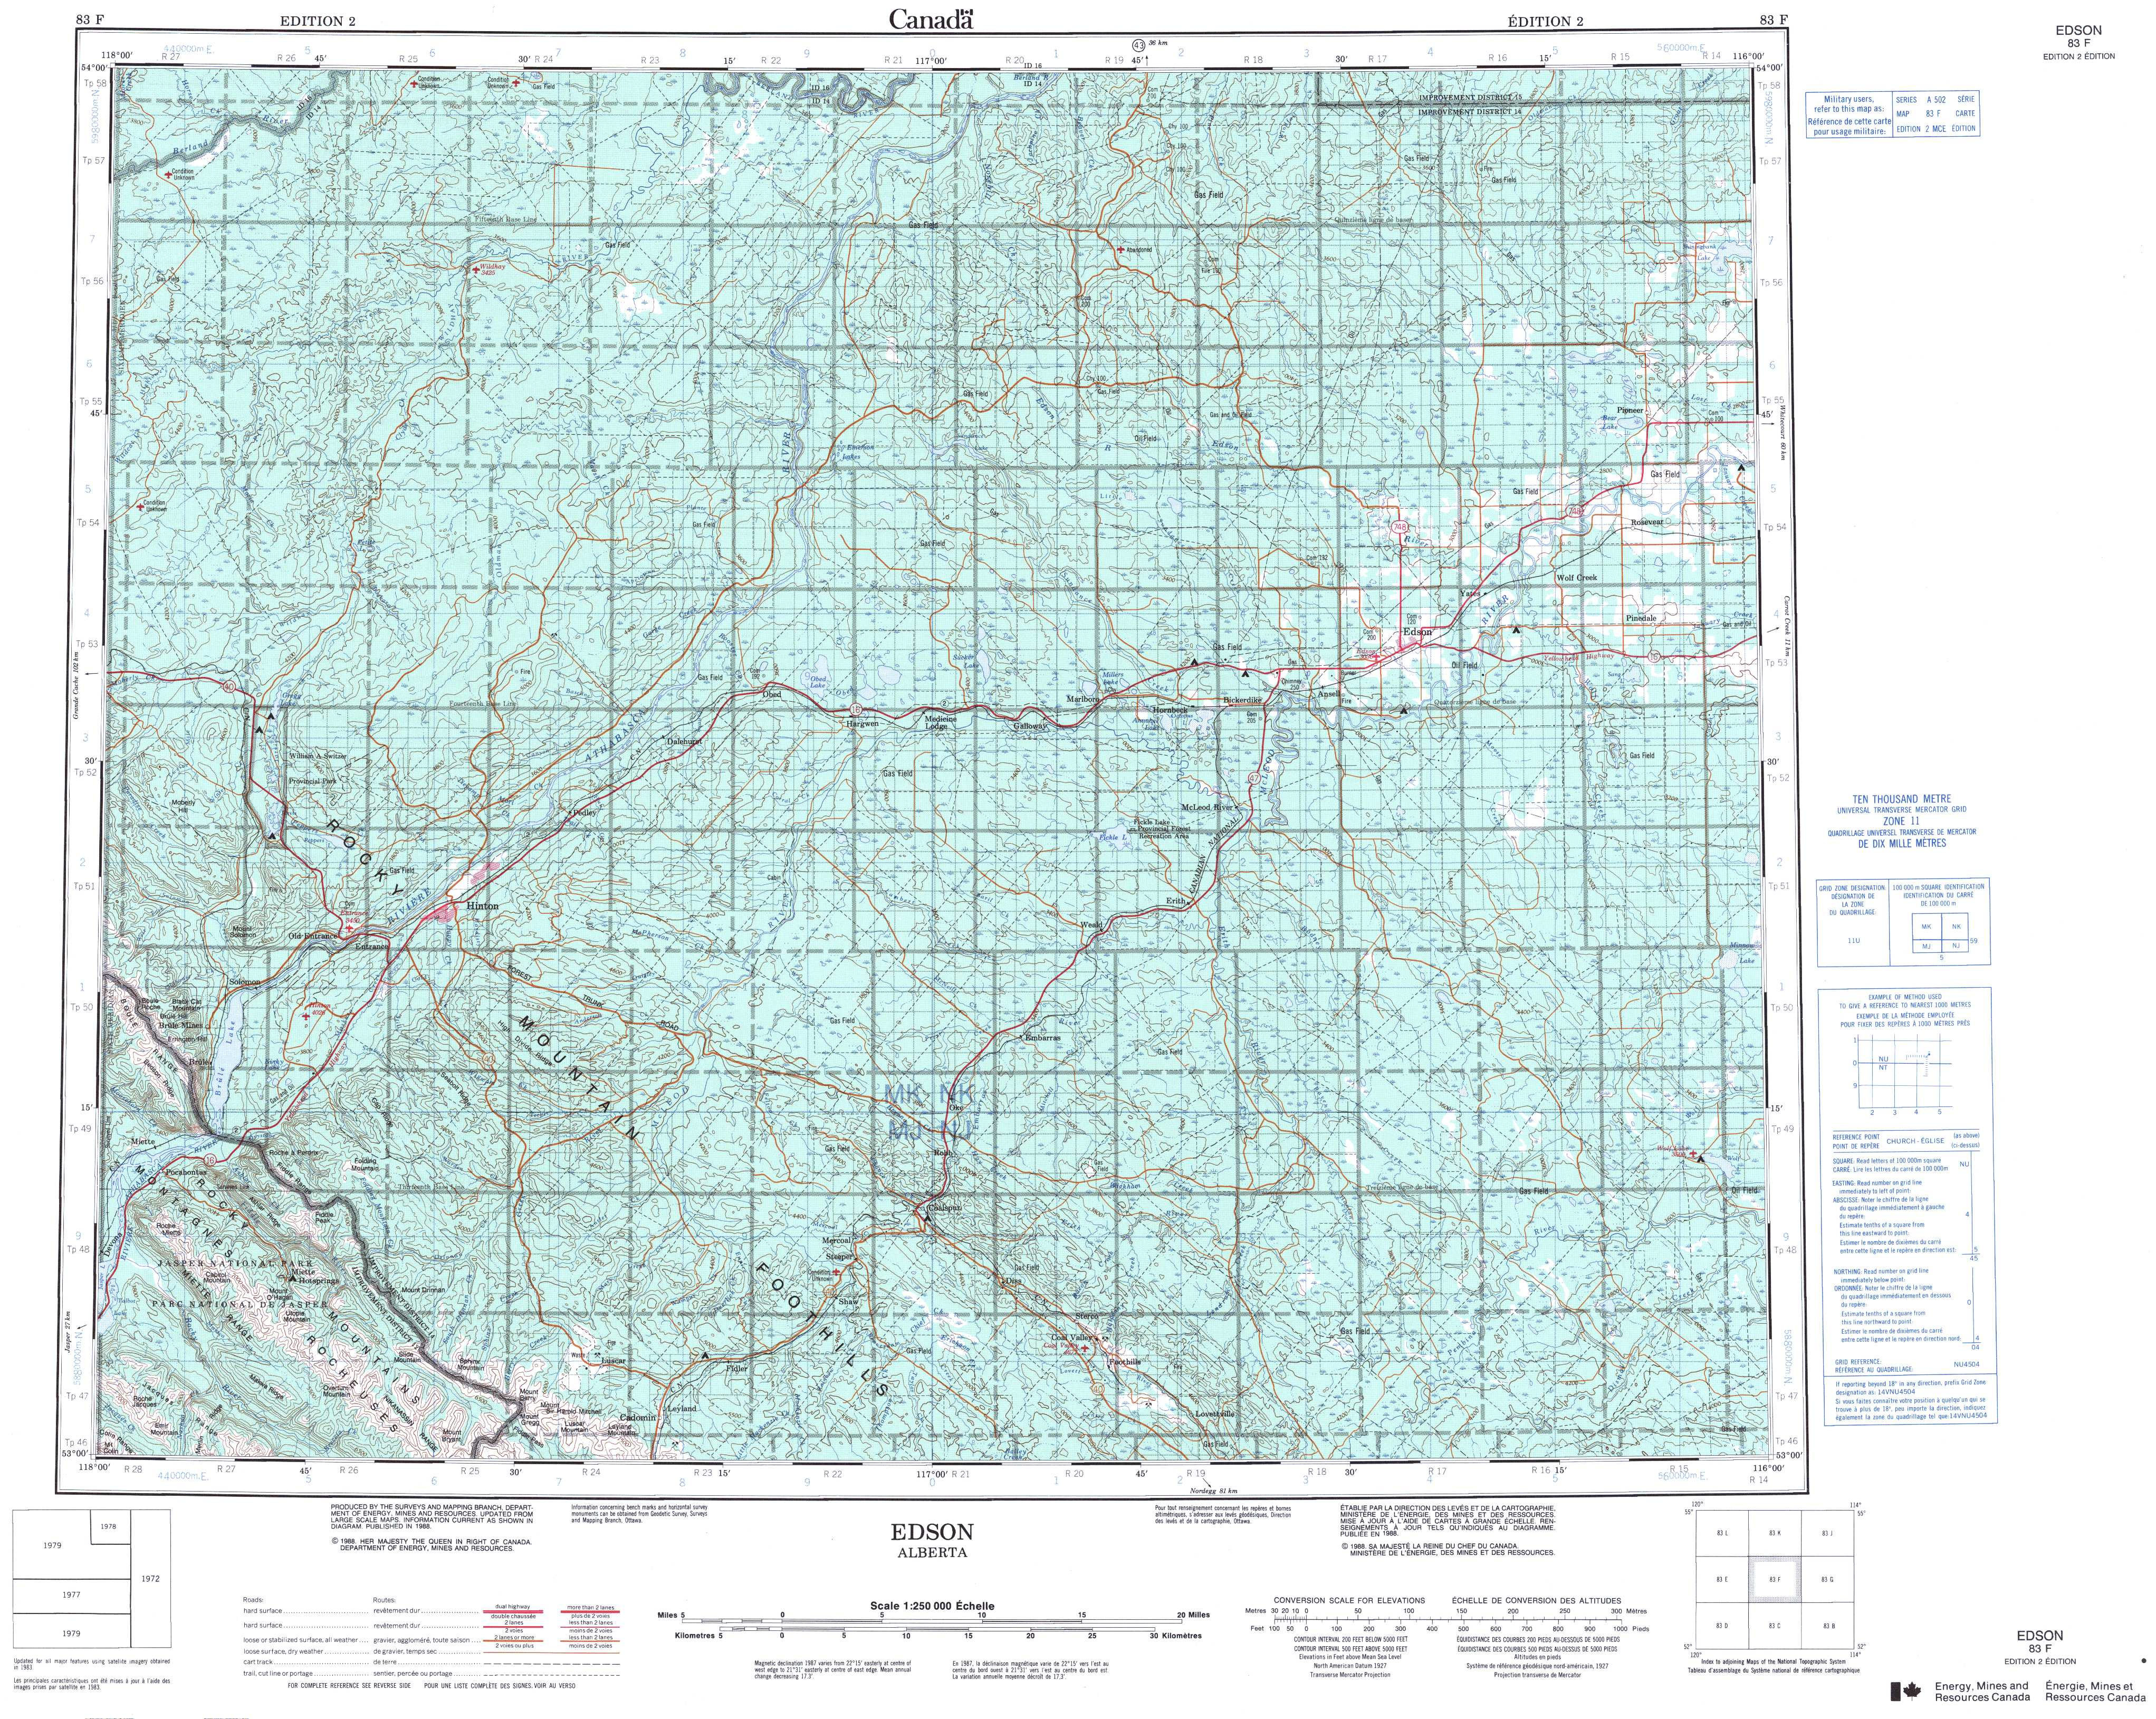 Printable Topographic Map Of Edson 083F, Ab - Printable Topo Maps Online